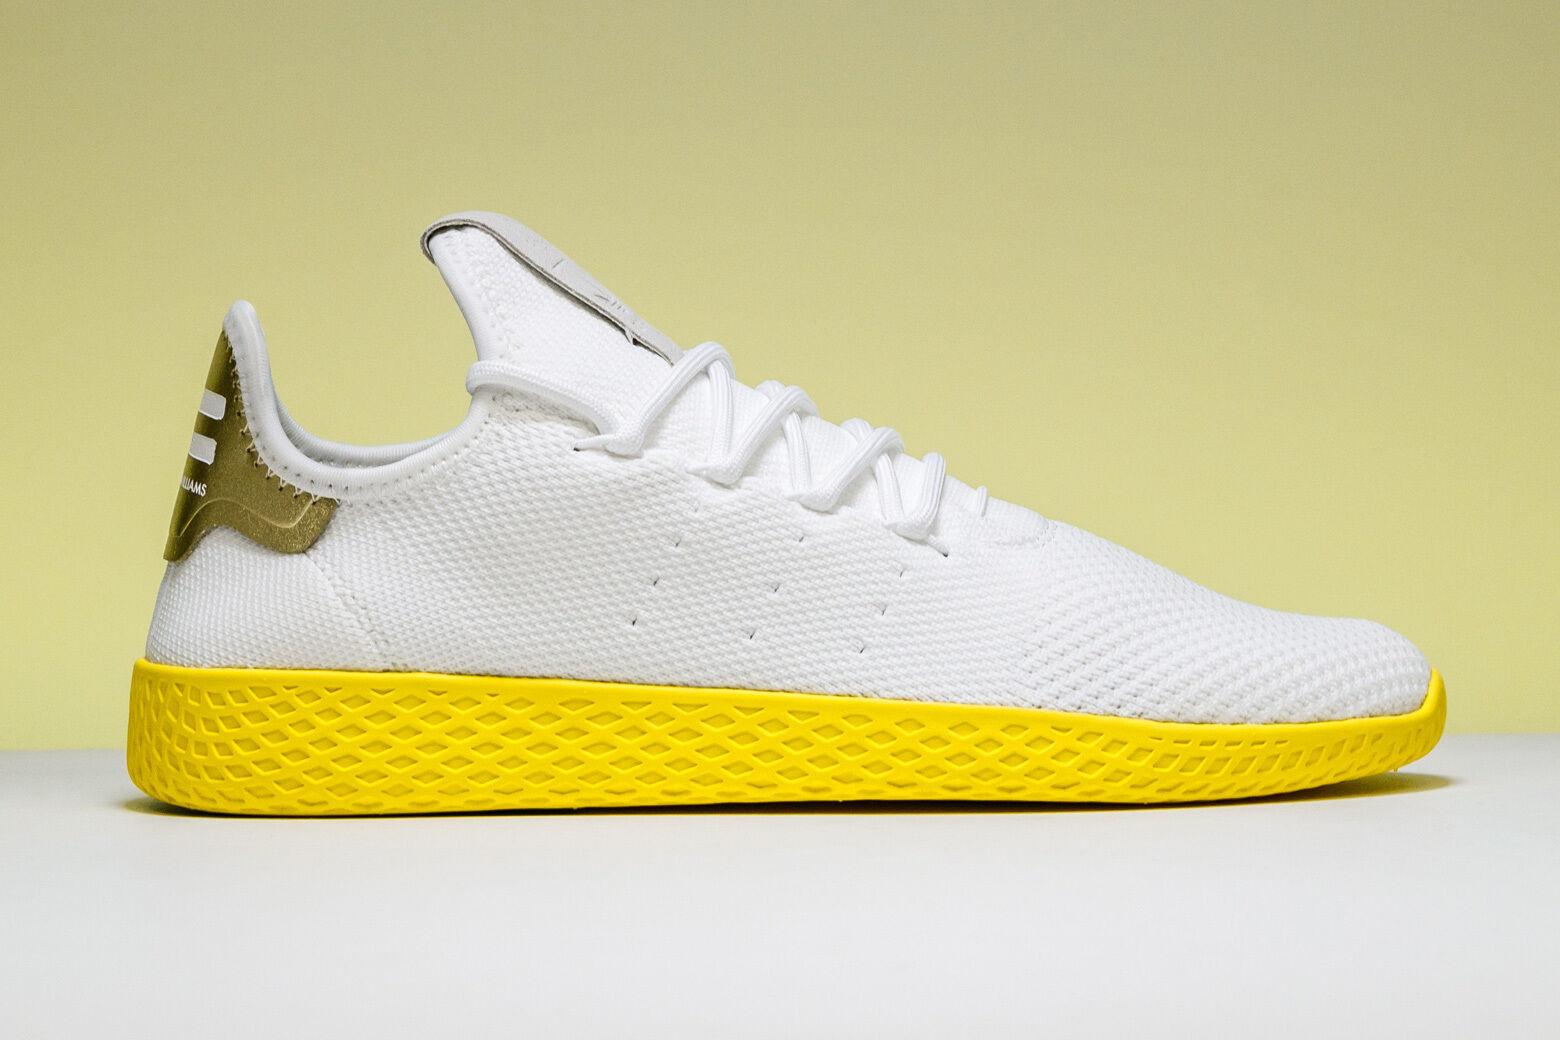 Adidas Adidas Adidas Pharrell Tennis HU PK Primeknit White Yellow BY2674 Size 6.5. nmd yeezy 0c420a